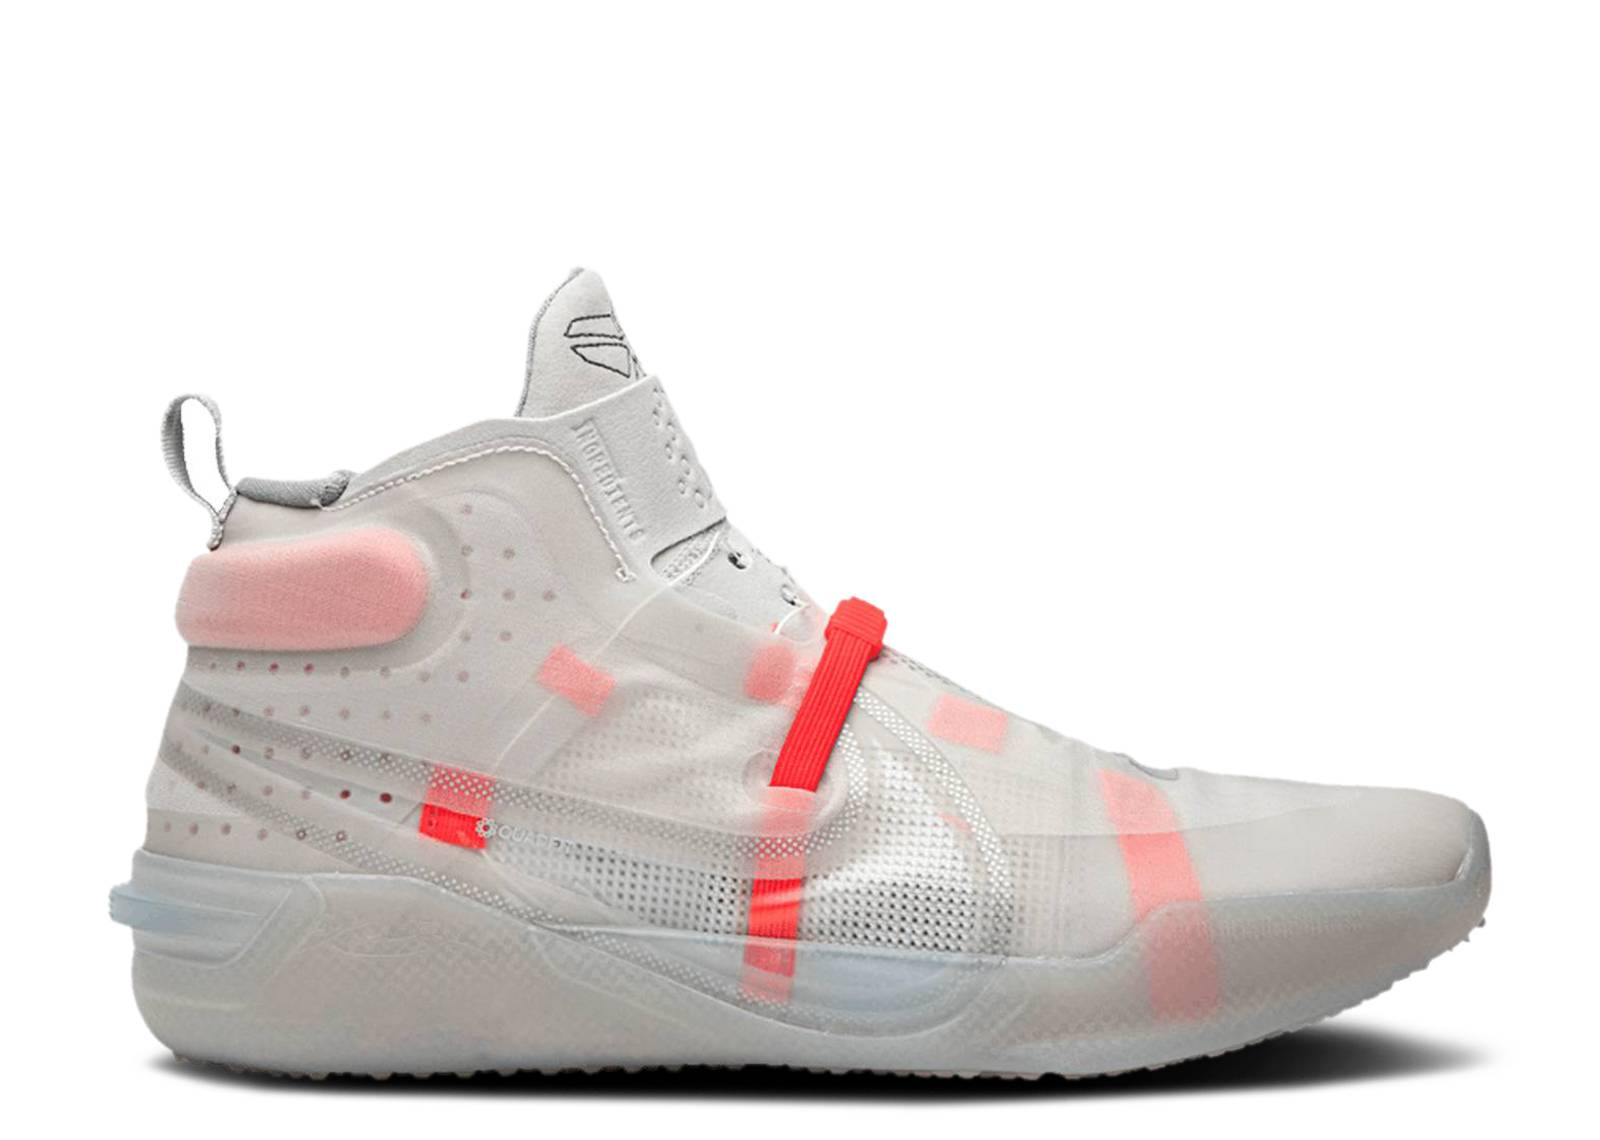 Kobe Ad Nxt Fastfit Vast Grey Nike Cd0458 001 Vast Grey Thunder Grey Flight Club